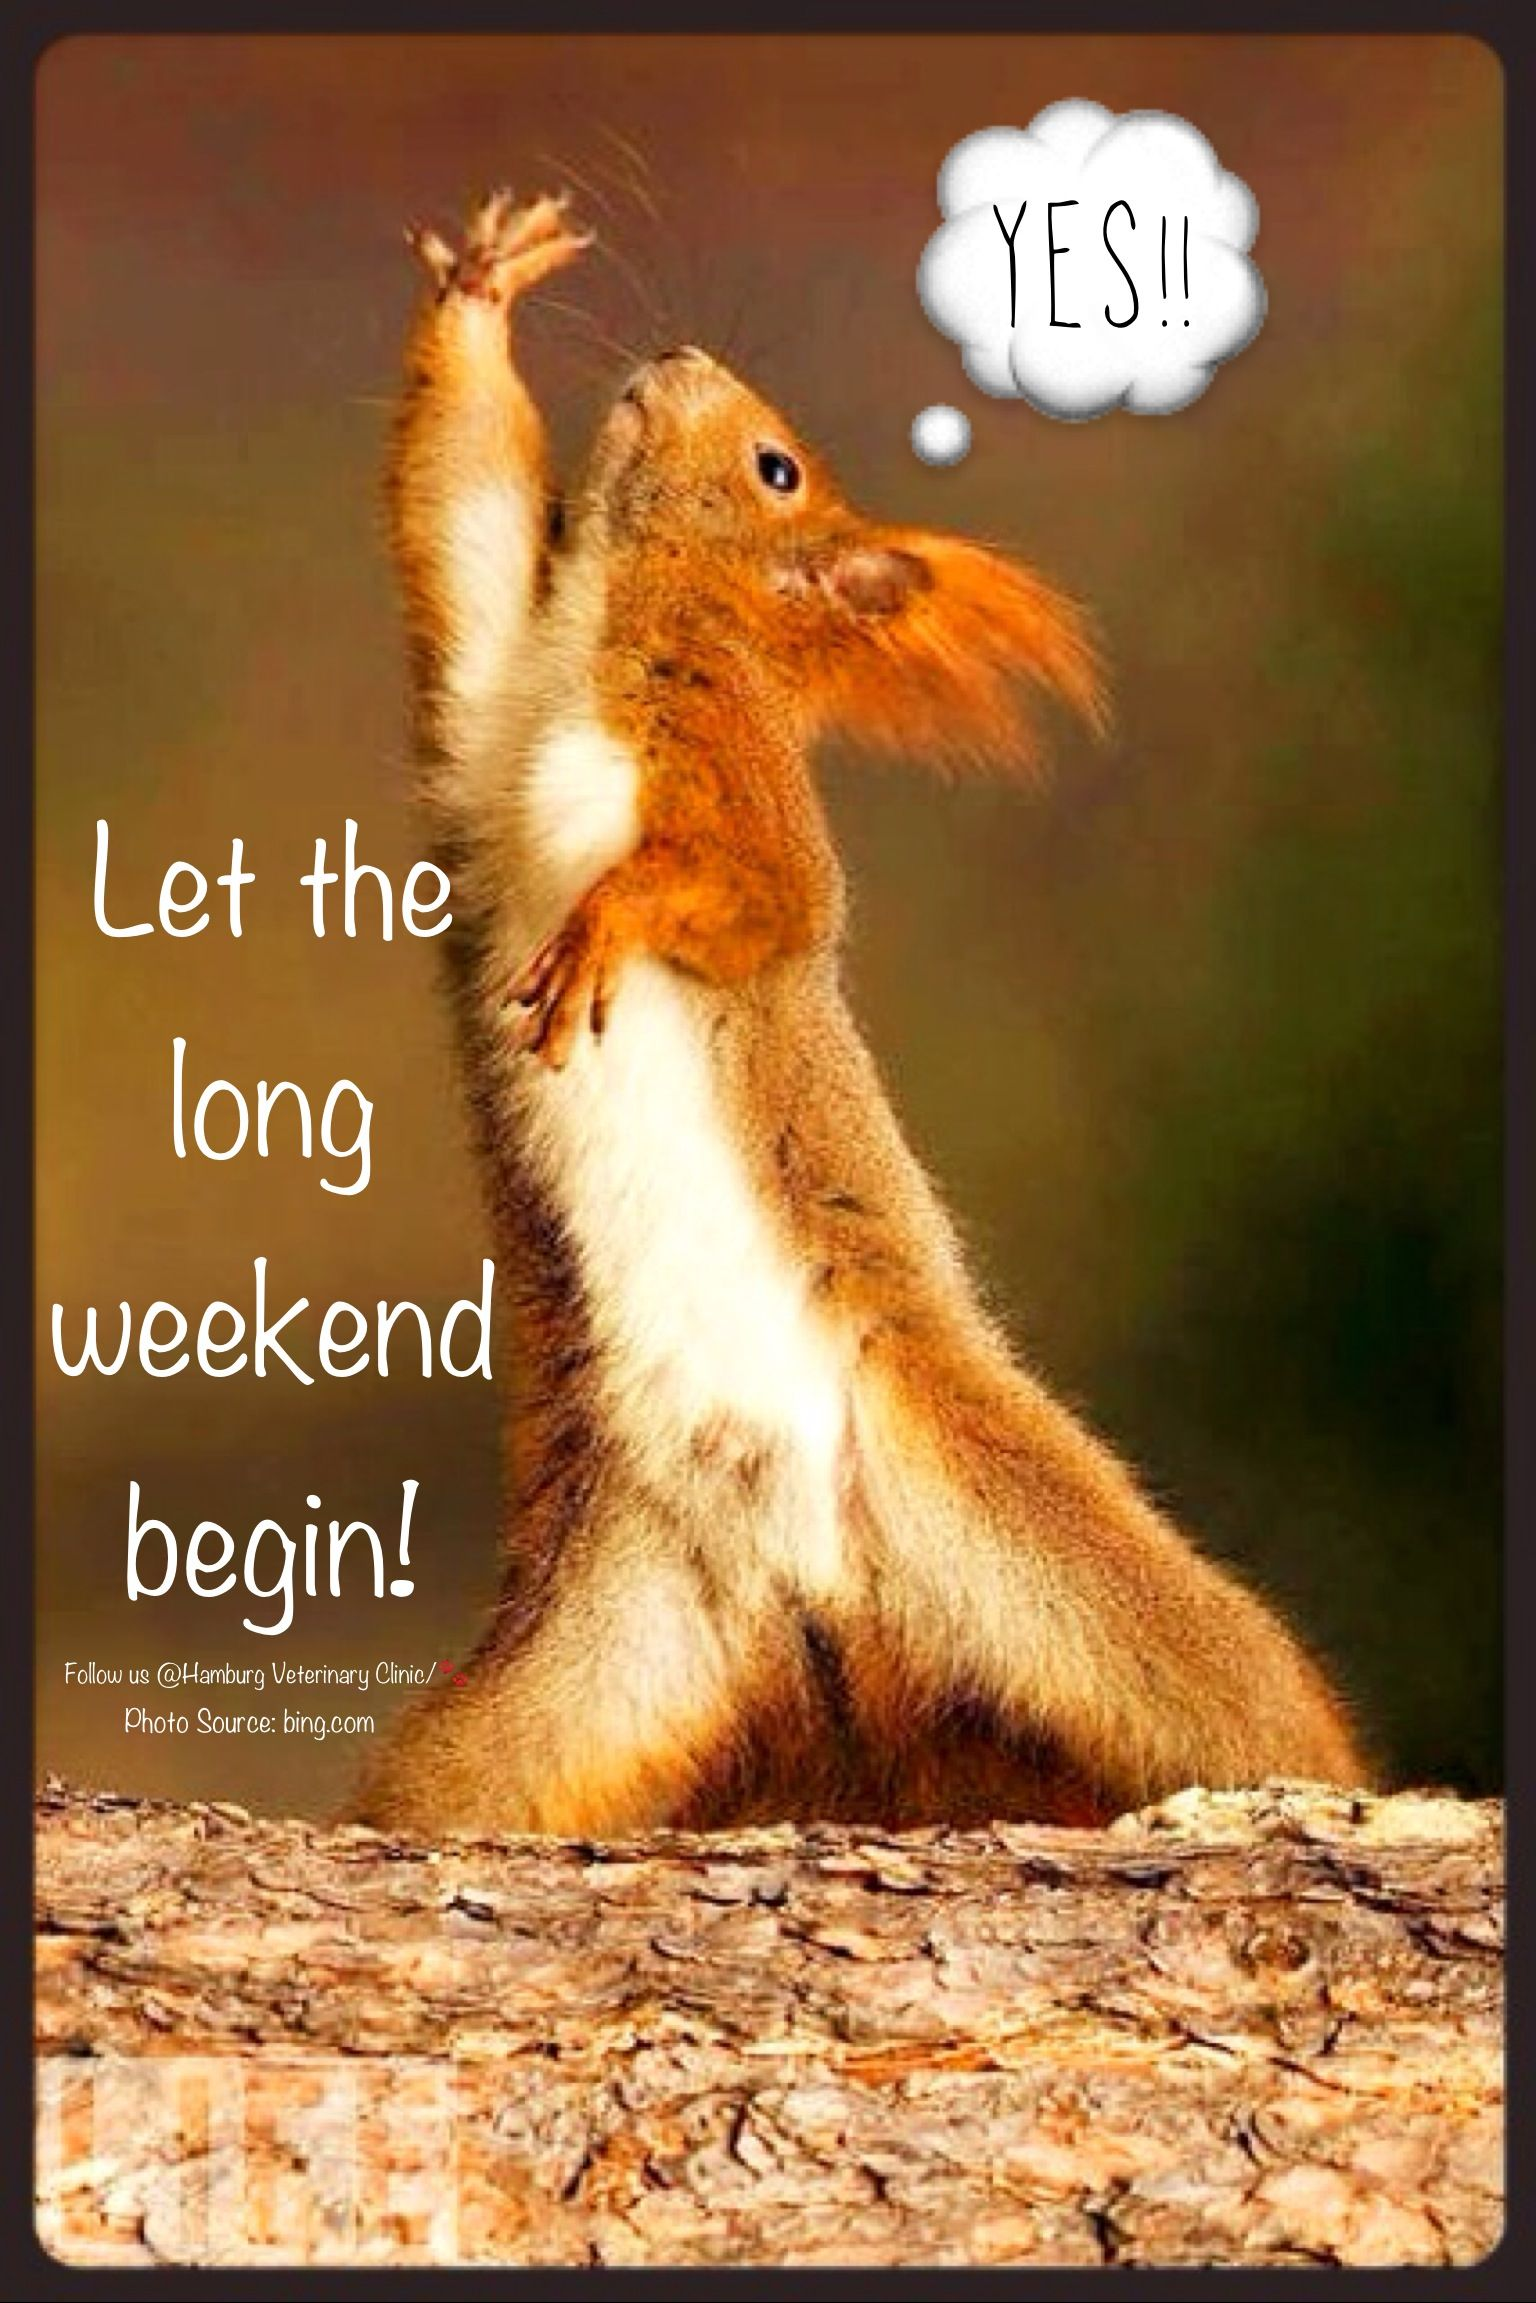 Weekend Funny Long Weekend Animal Funny Cute Squirrel Celebrate Relax Enjoy Weekend Enjoy Life Funny Weekend Quotes Weekend Humor Long Weekend